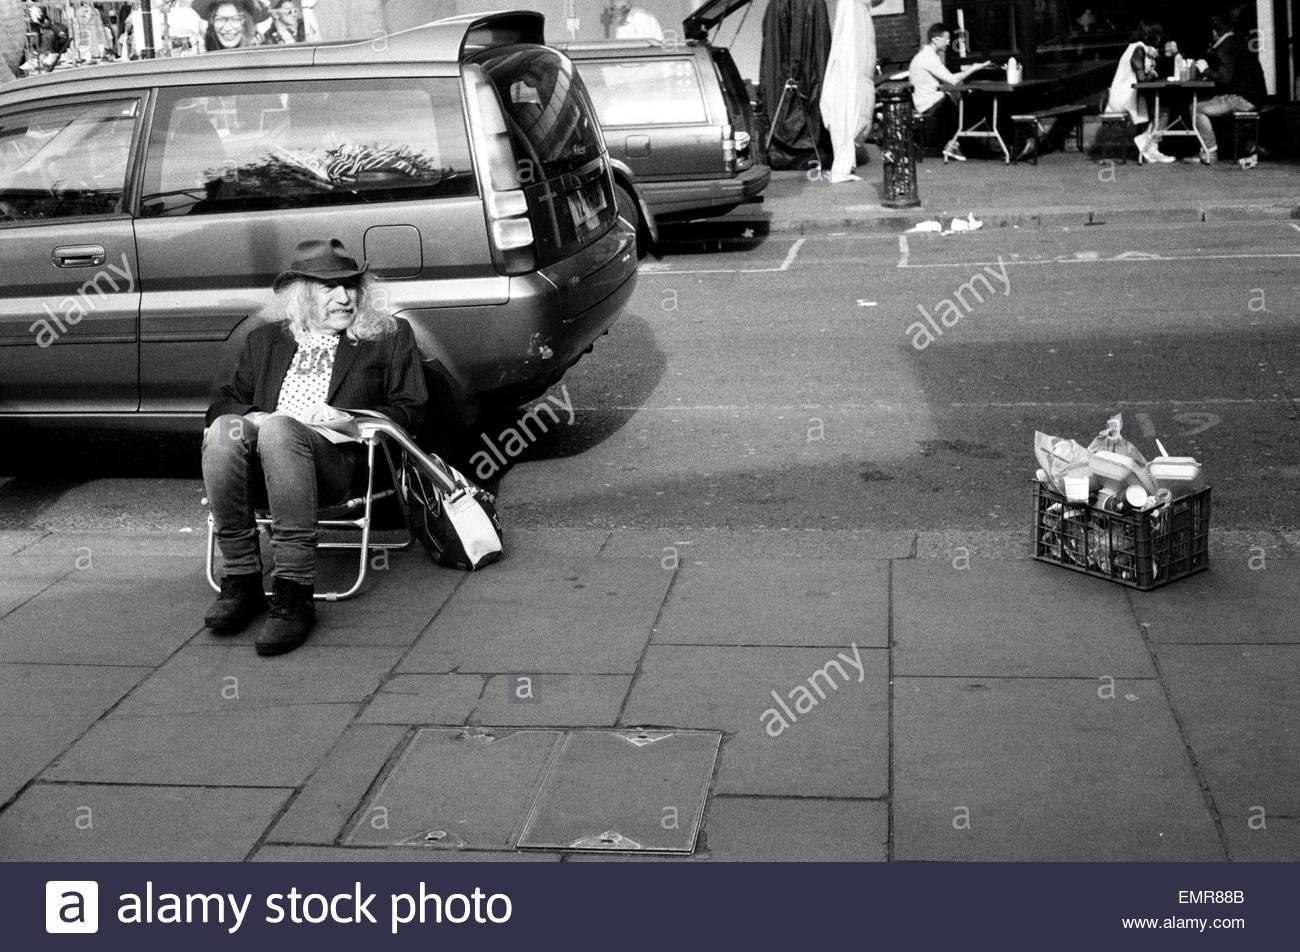 A market trader sits at  Portobello Green on Portobello Road, Notting Hill London, England UK. - Stock Image